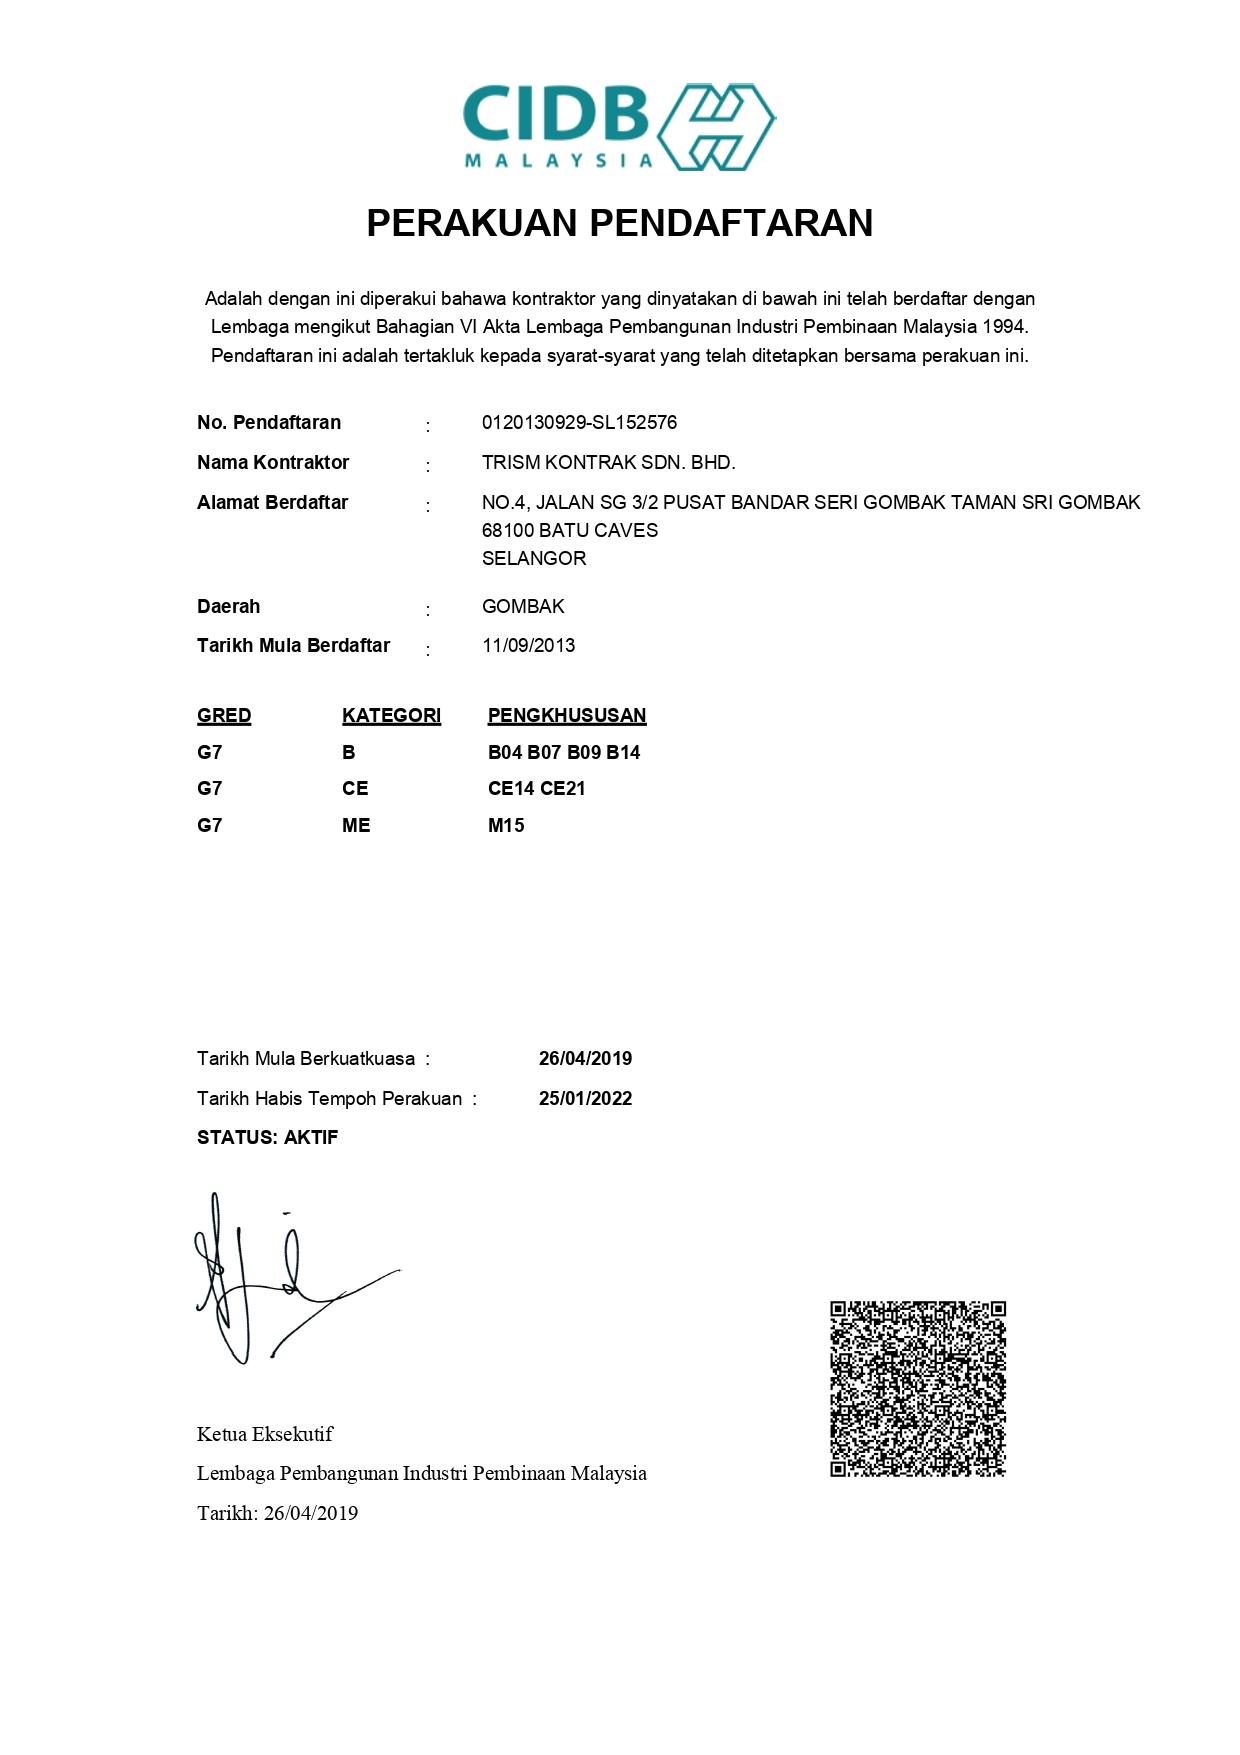 Trism Kontrak Sdn Bhd Ifp Advisors Group